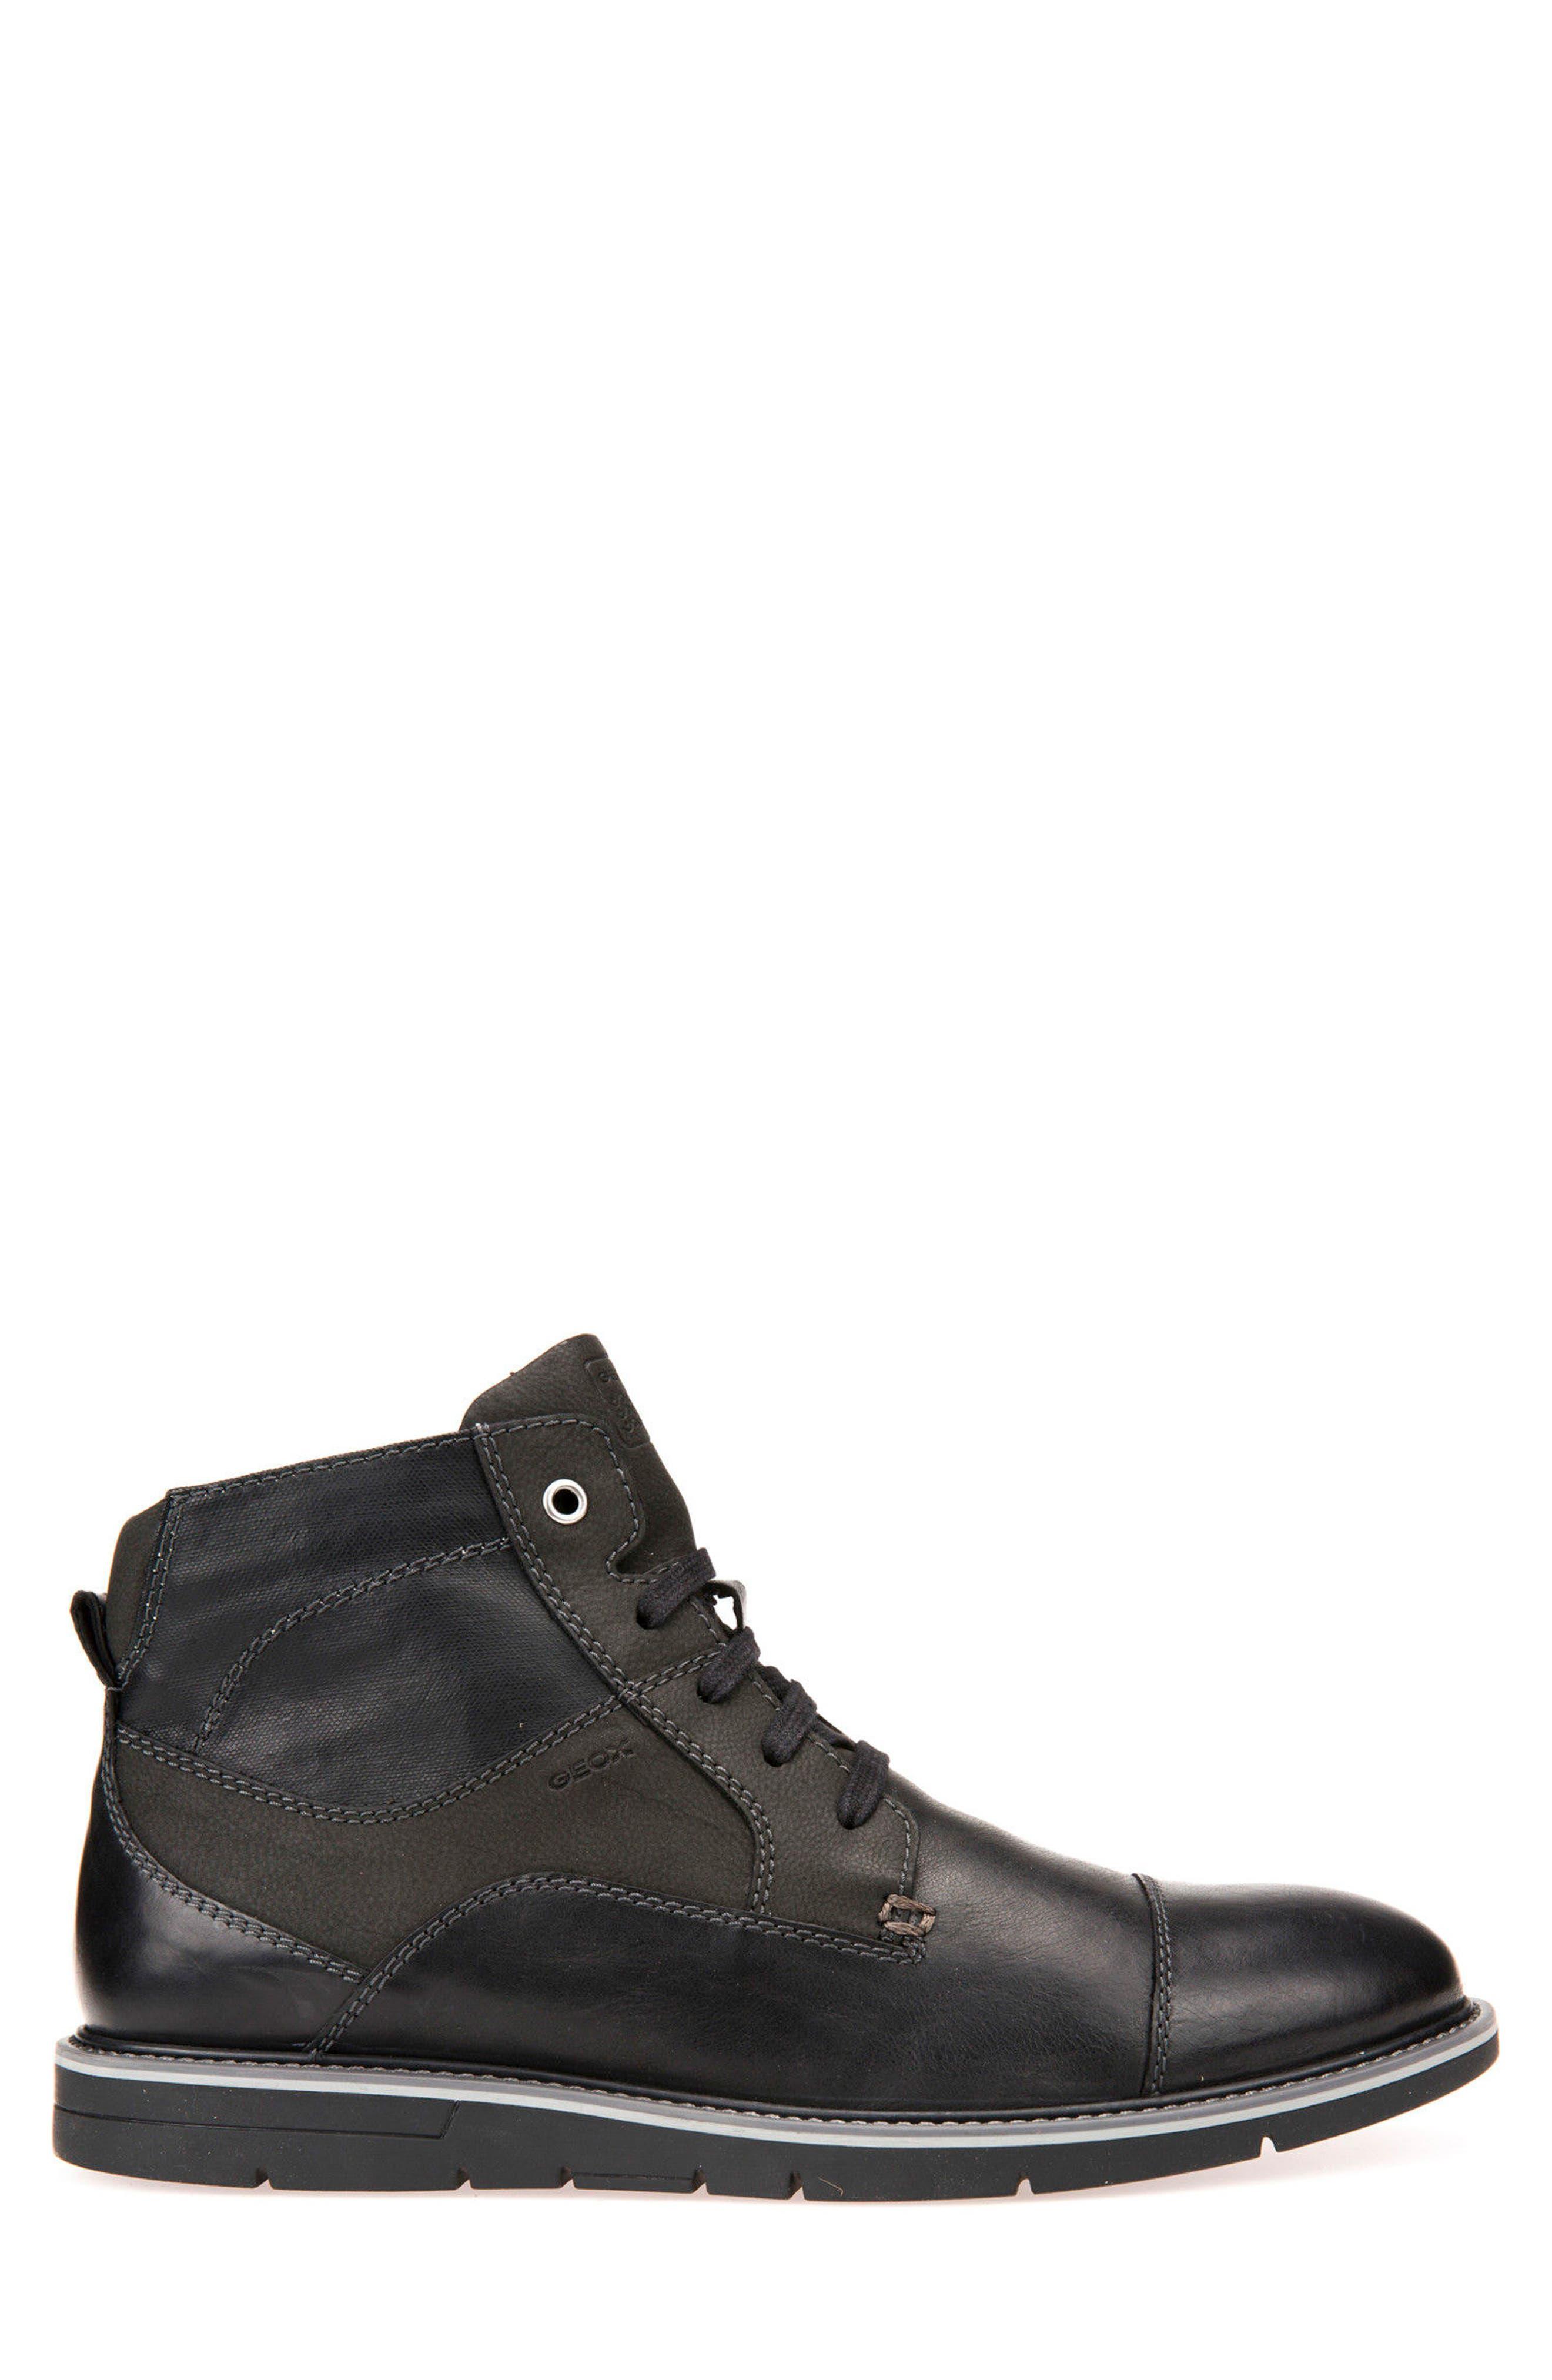 Alternate Image 3  - Geox Muvet 5 Cap Toe Boot (men)